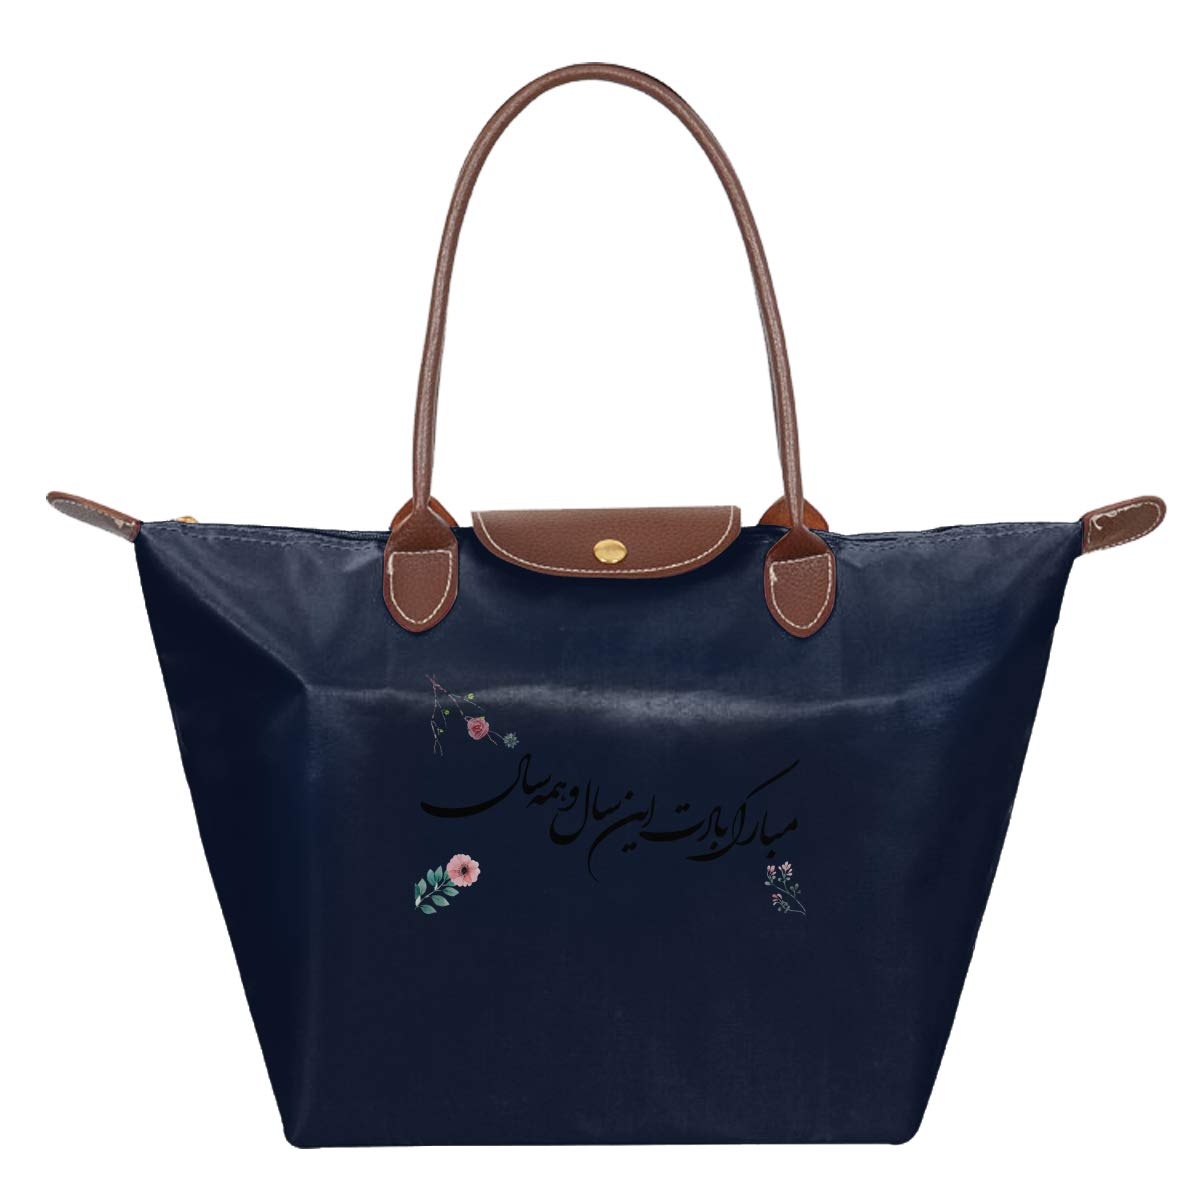 Nowruz The Persian New Year Waterproof Leather Folded Messenger Nylon Bag Travel Tote Hopping Folding School Handbags